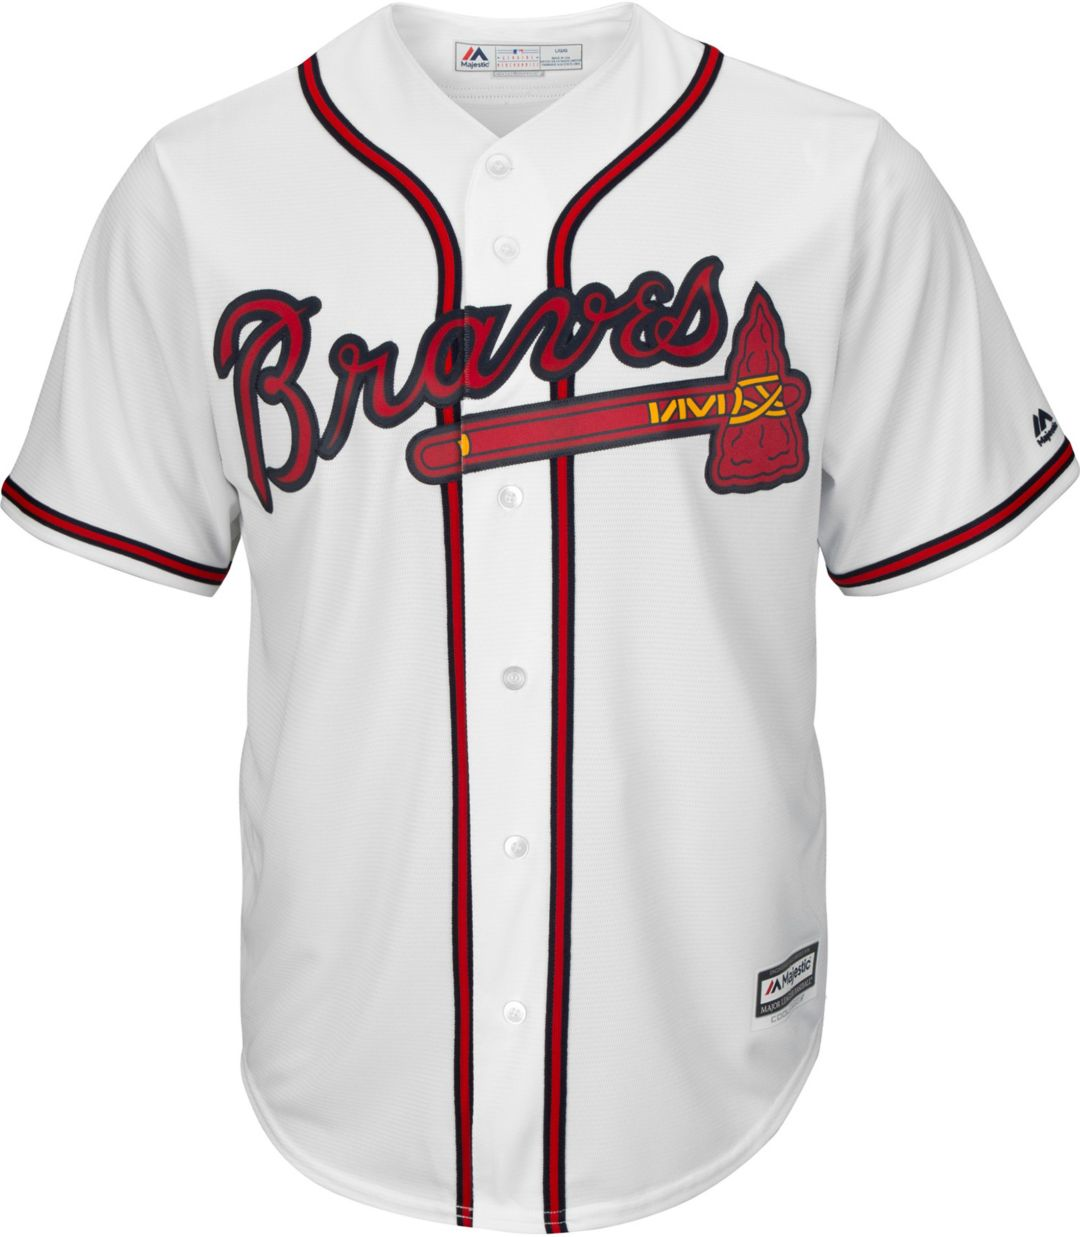 sale retailer cfc67 f1580 Youth Replica Atlanta Braves Ronald Acuña #13 Home White Jersey